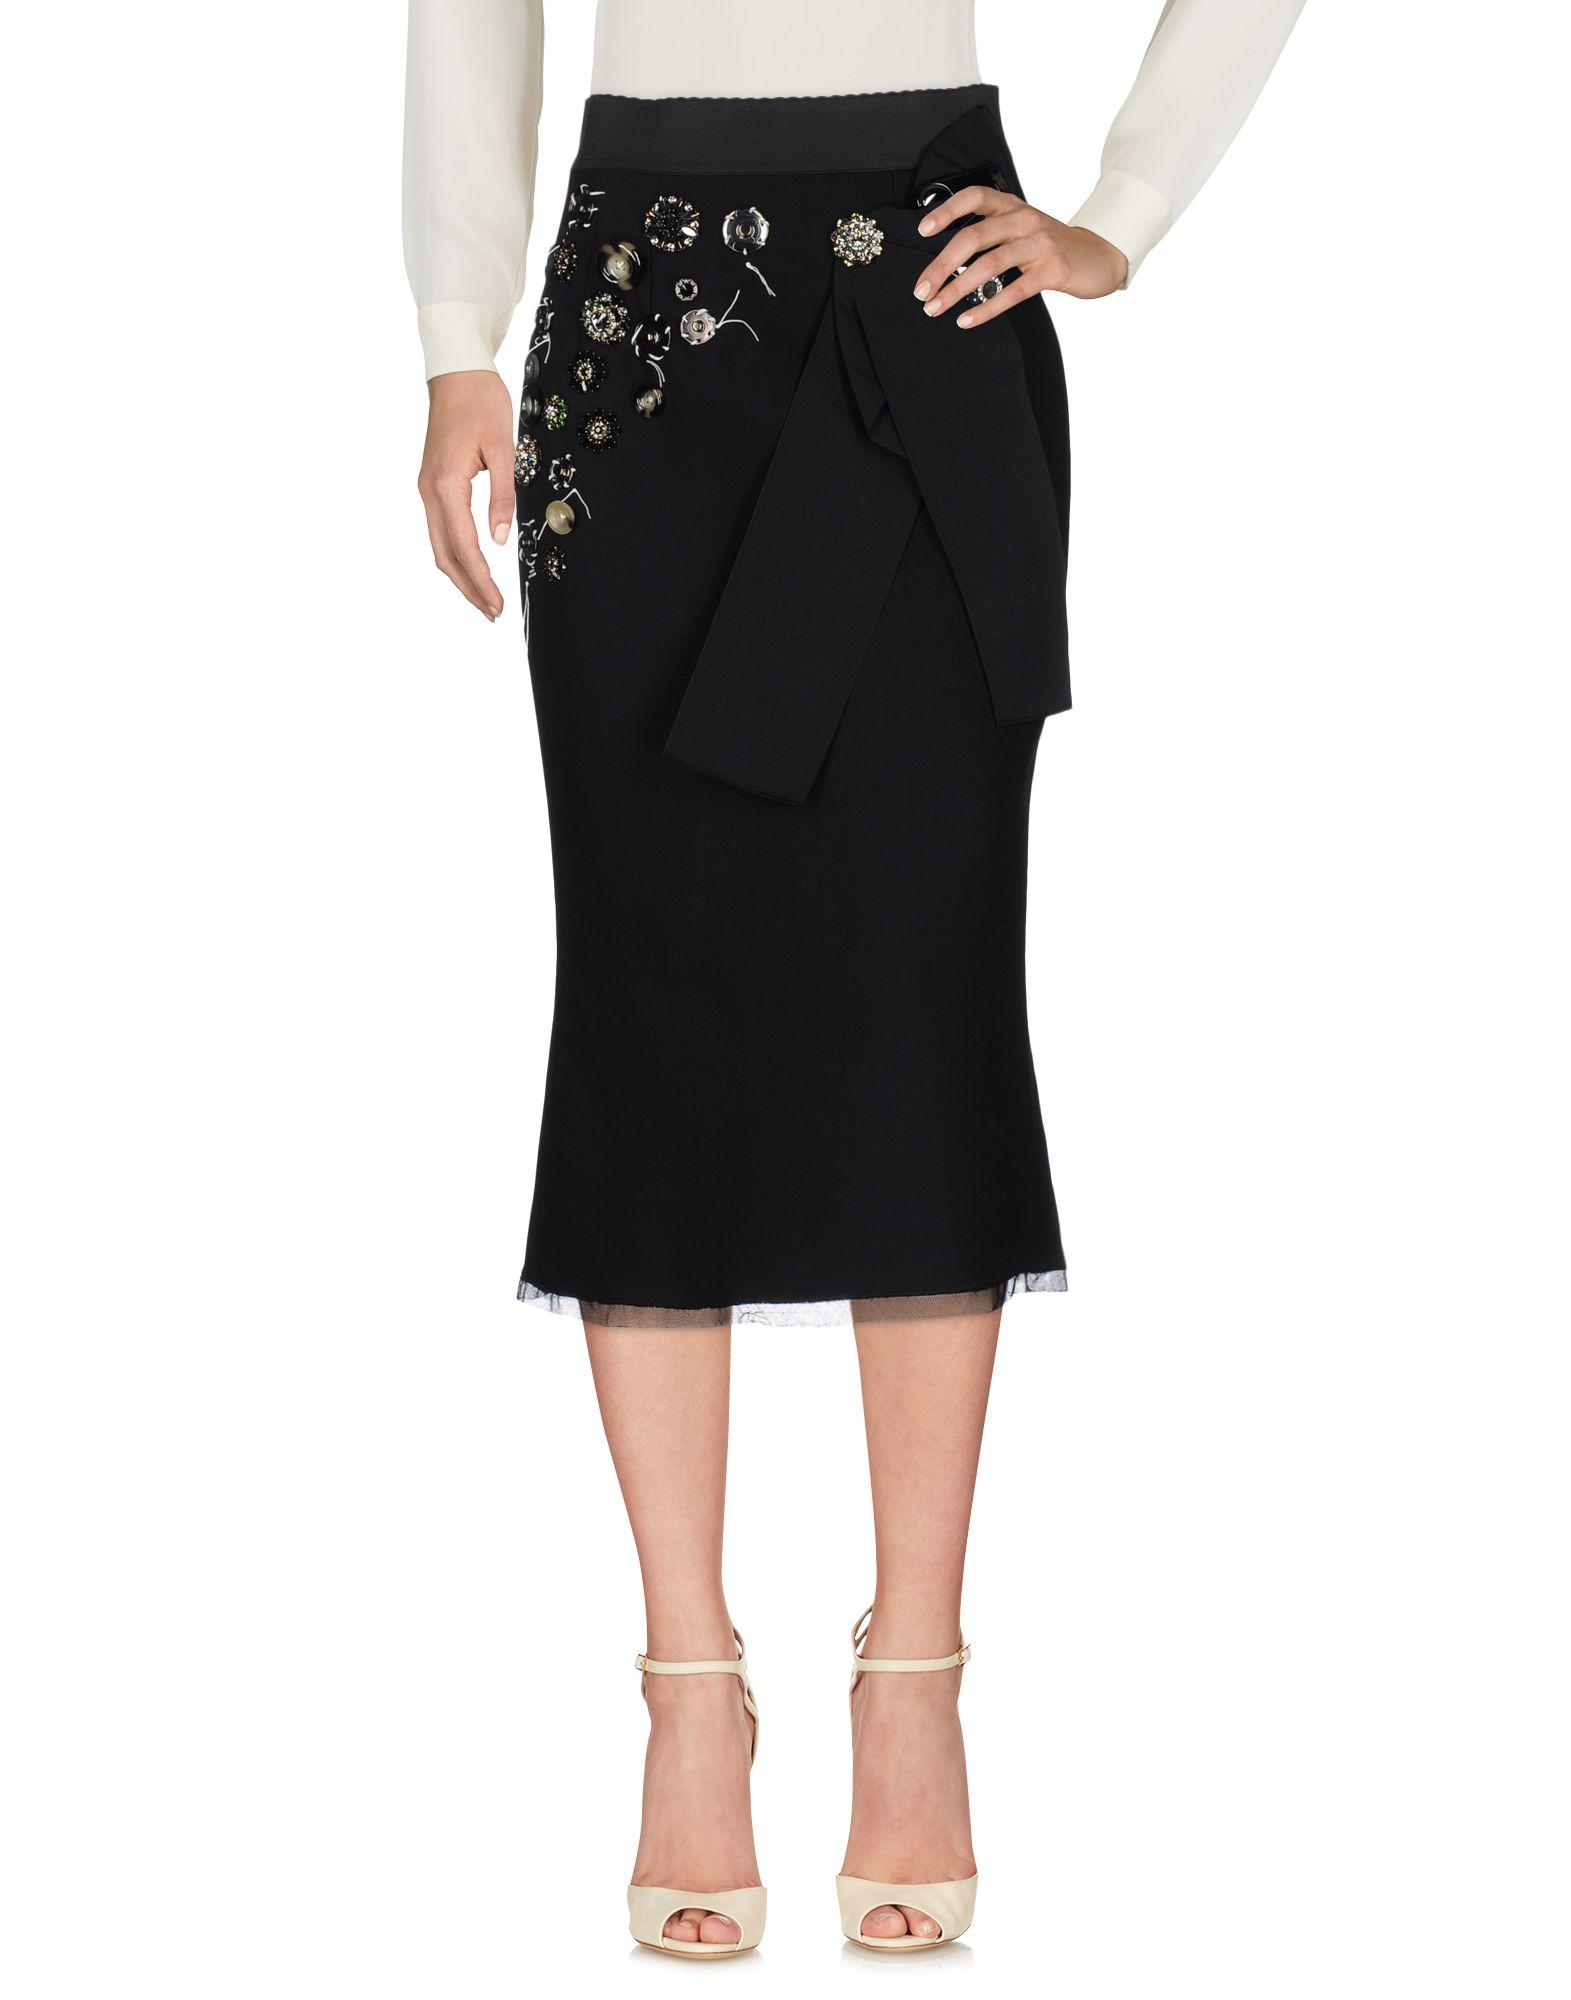 Gonna Longuette Dolce & Gabbana Donna - Acquista online su 6lcd2f2